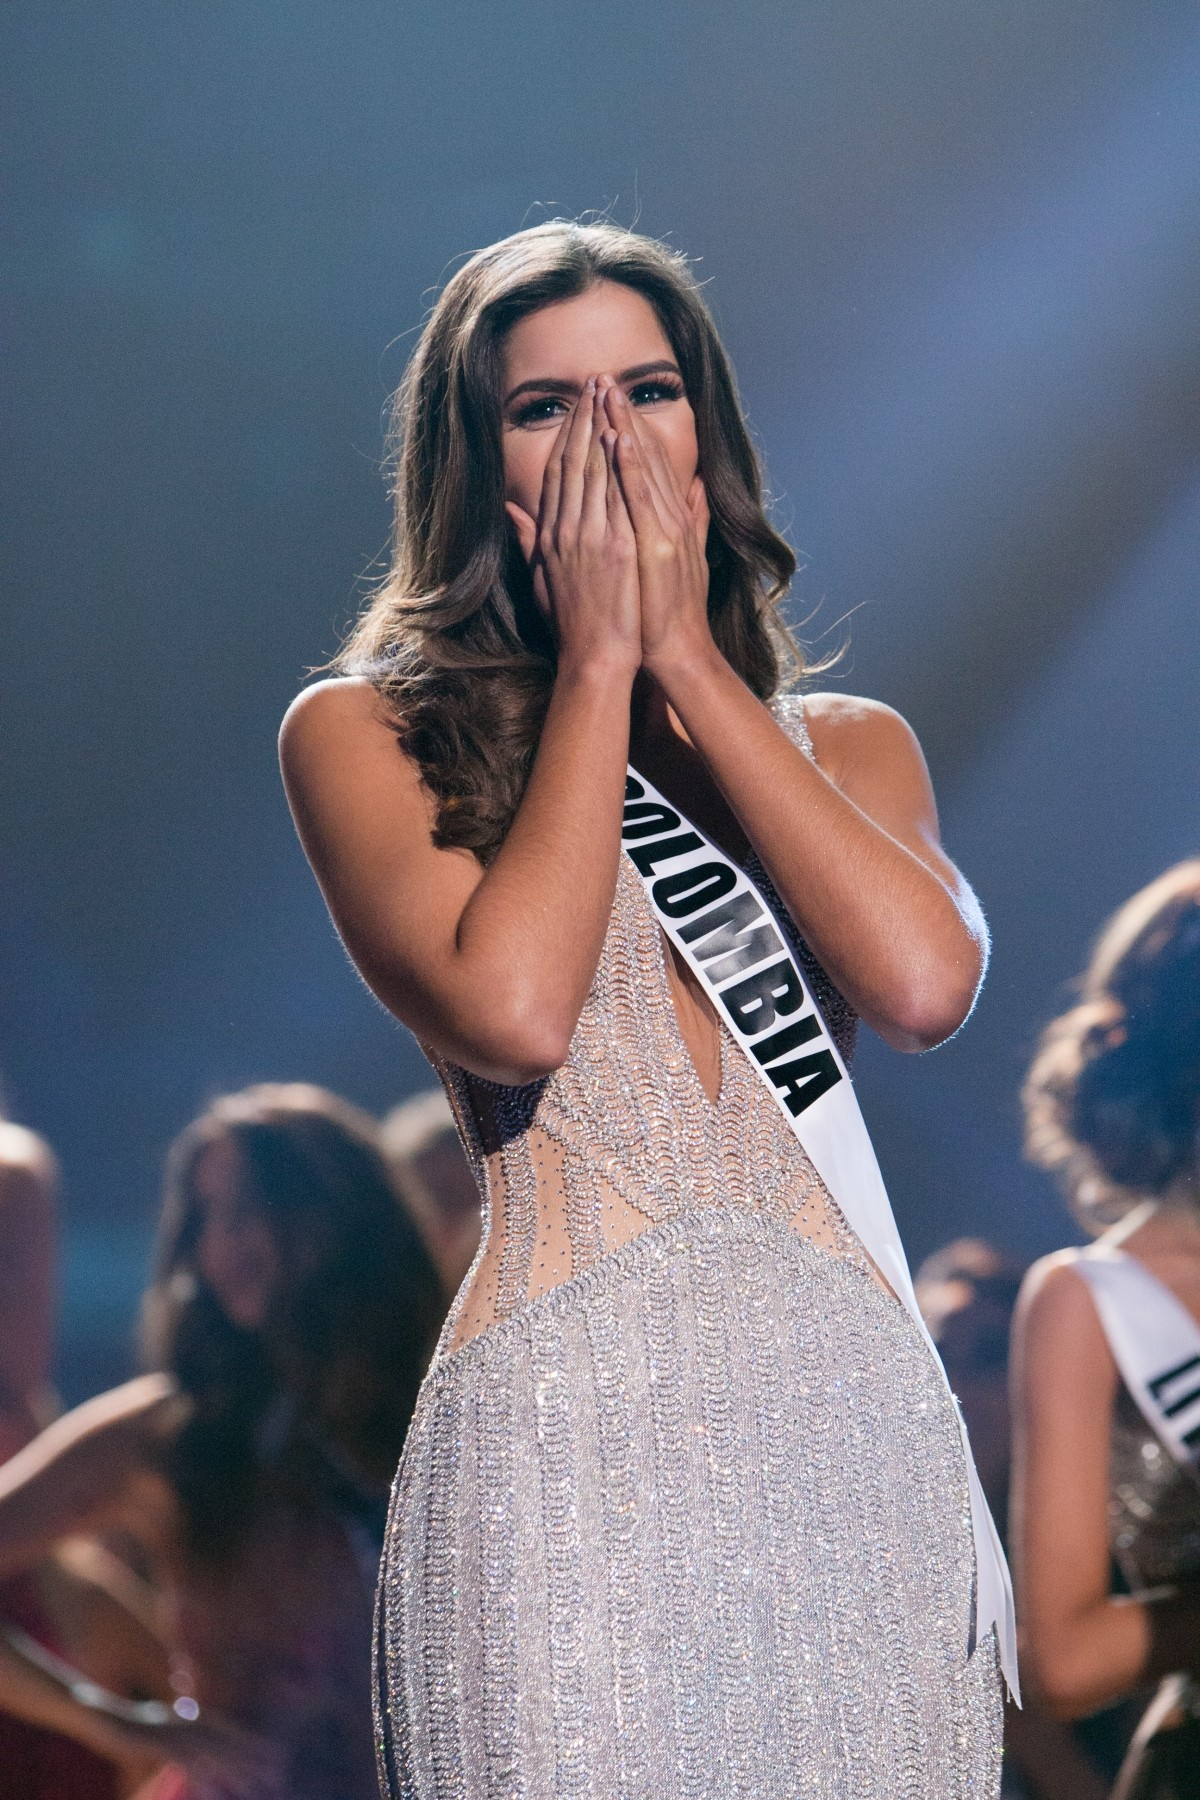 miss paulina vega wins miss universe 2014 title complete paulina vega